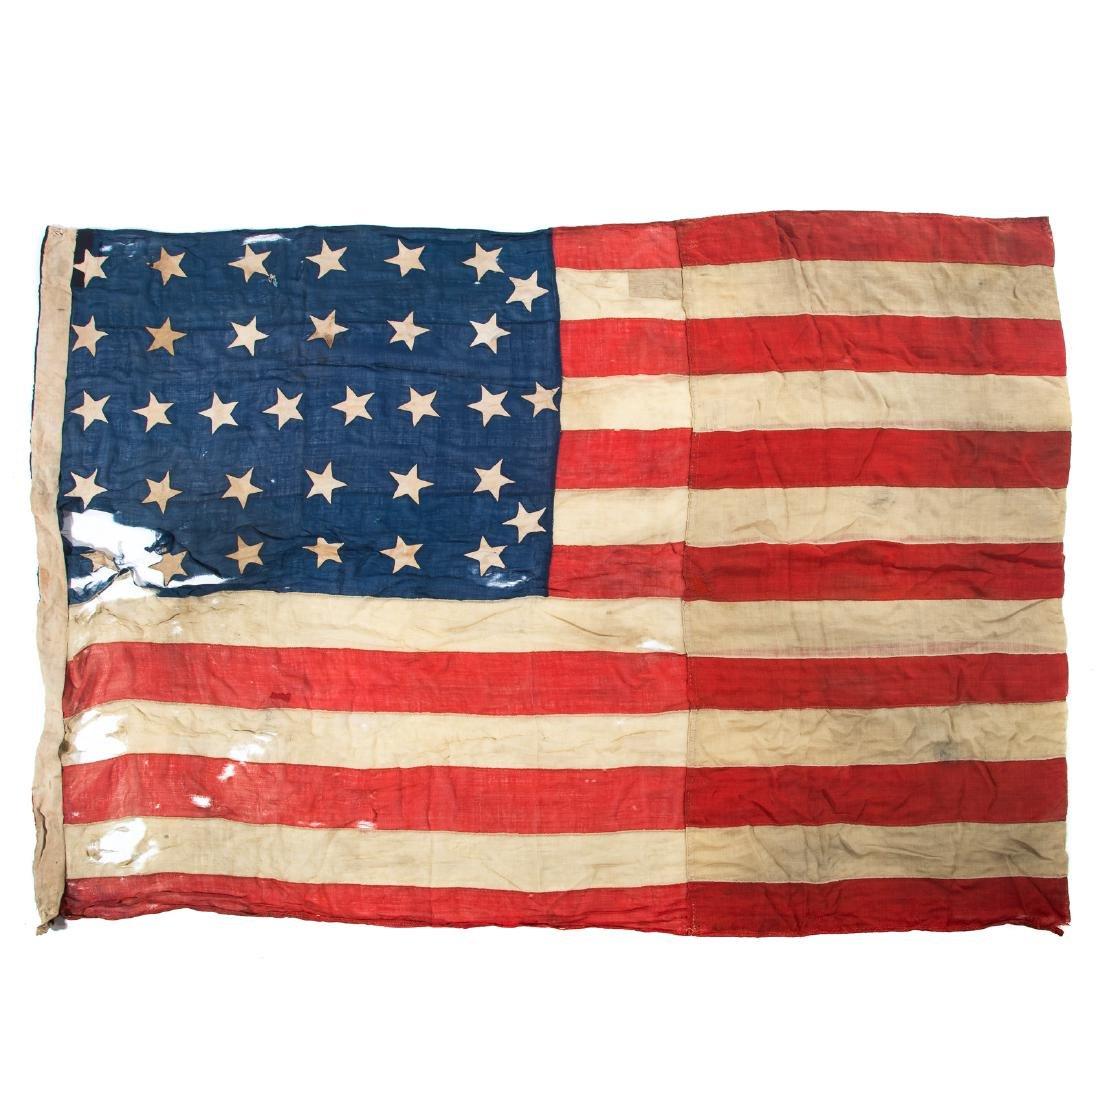 United States 34-star garrison flag